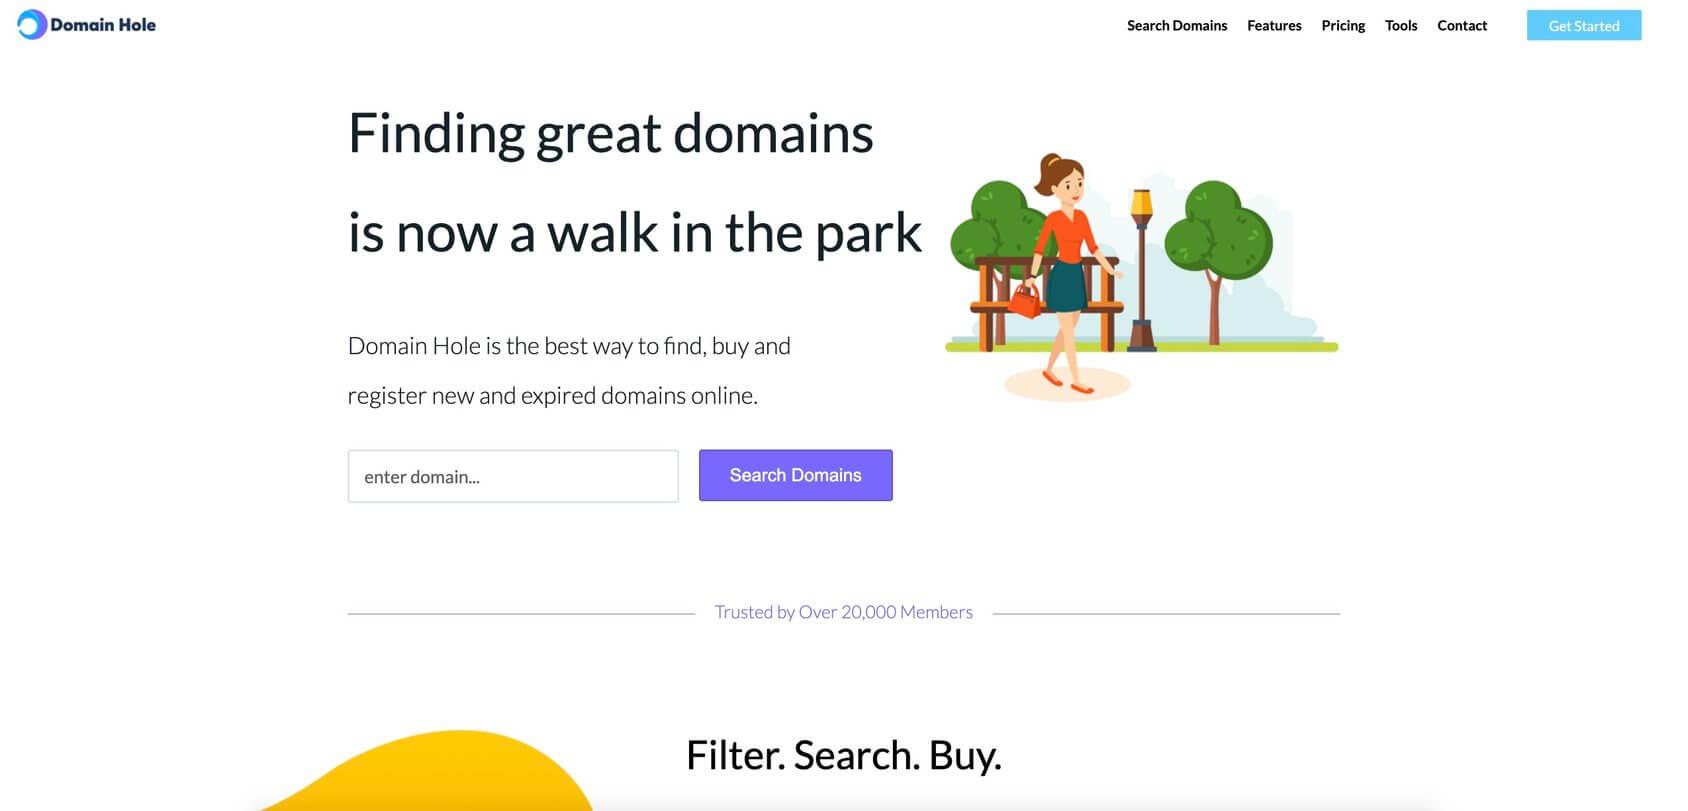 Domain Hole homepage